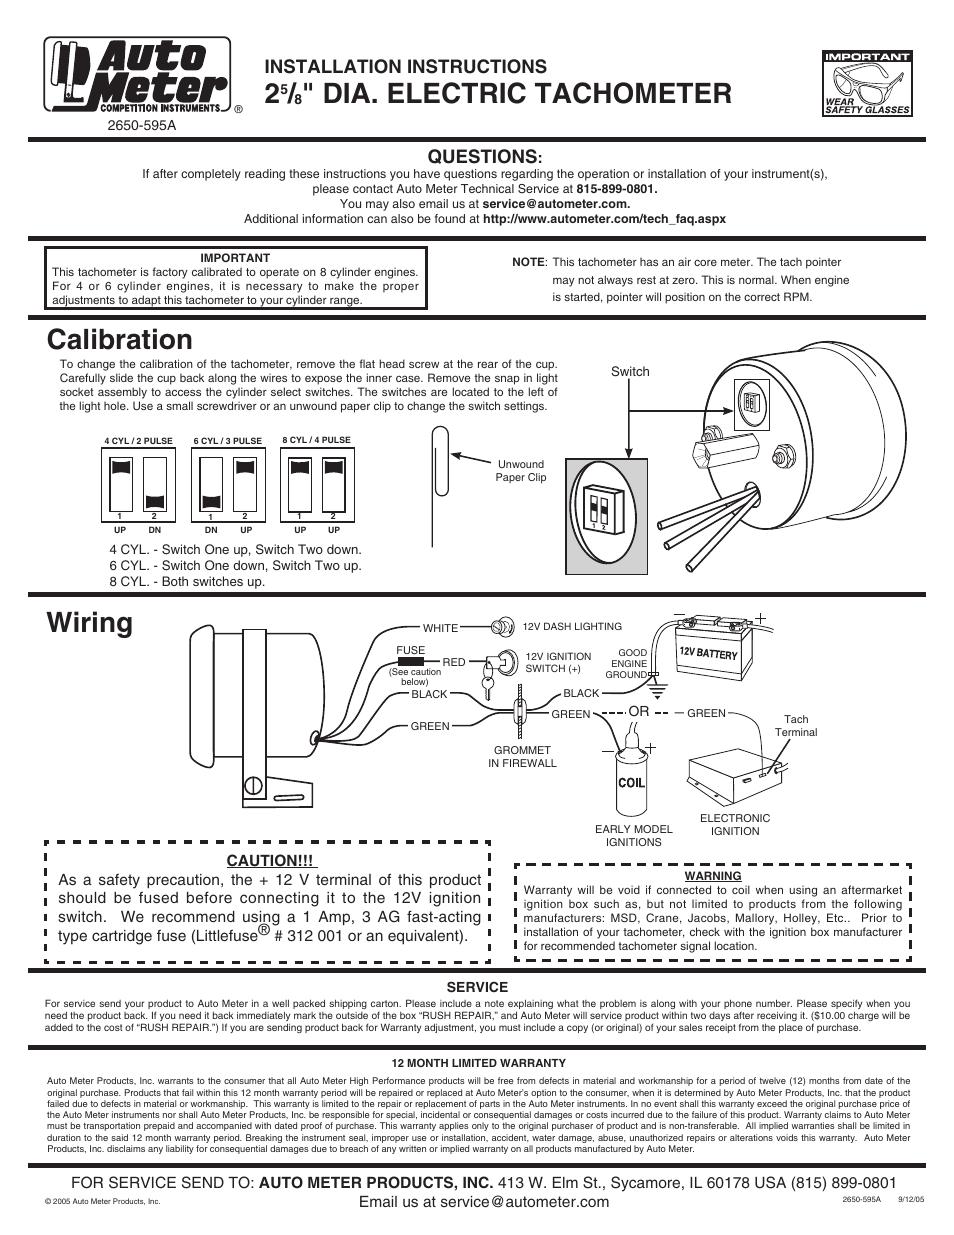 Vdo Tachometer Wiring Diagram Chevy Detailed Schematic Diagrams Dragon Tach 4 Cylinder Portal U2022 Amp Installation